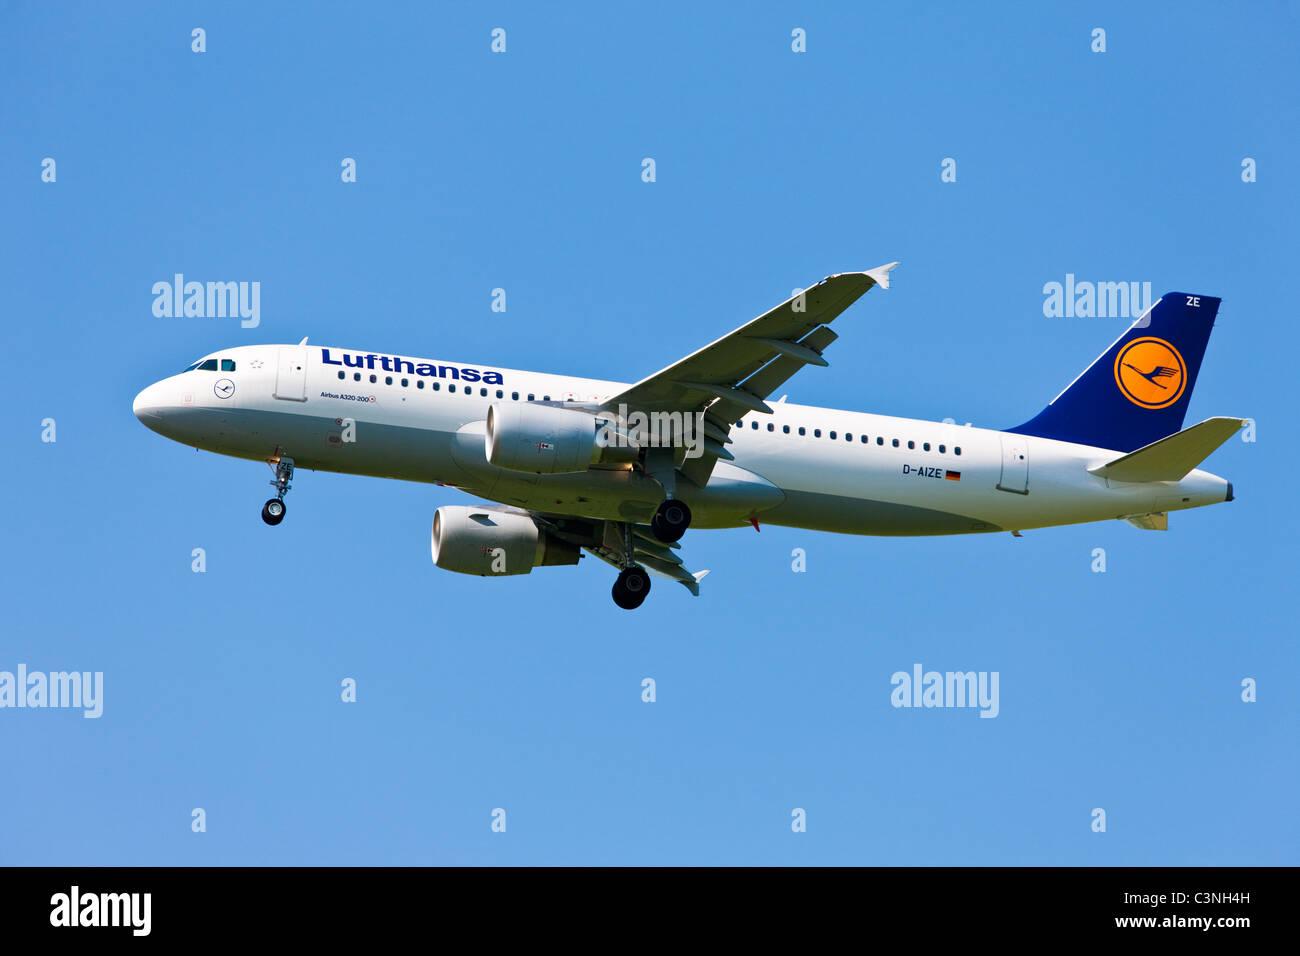 Flight Lufthansa ( Airbus A320-200 ) landing - Stock Image